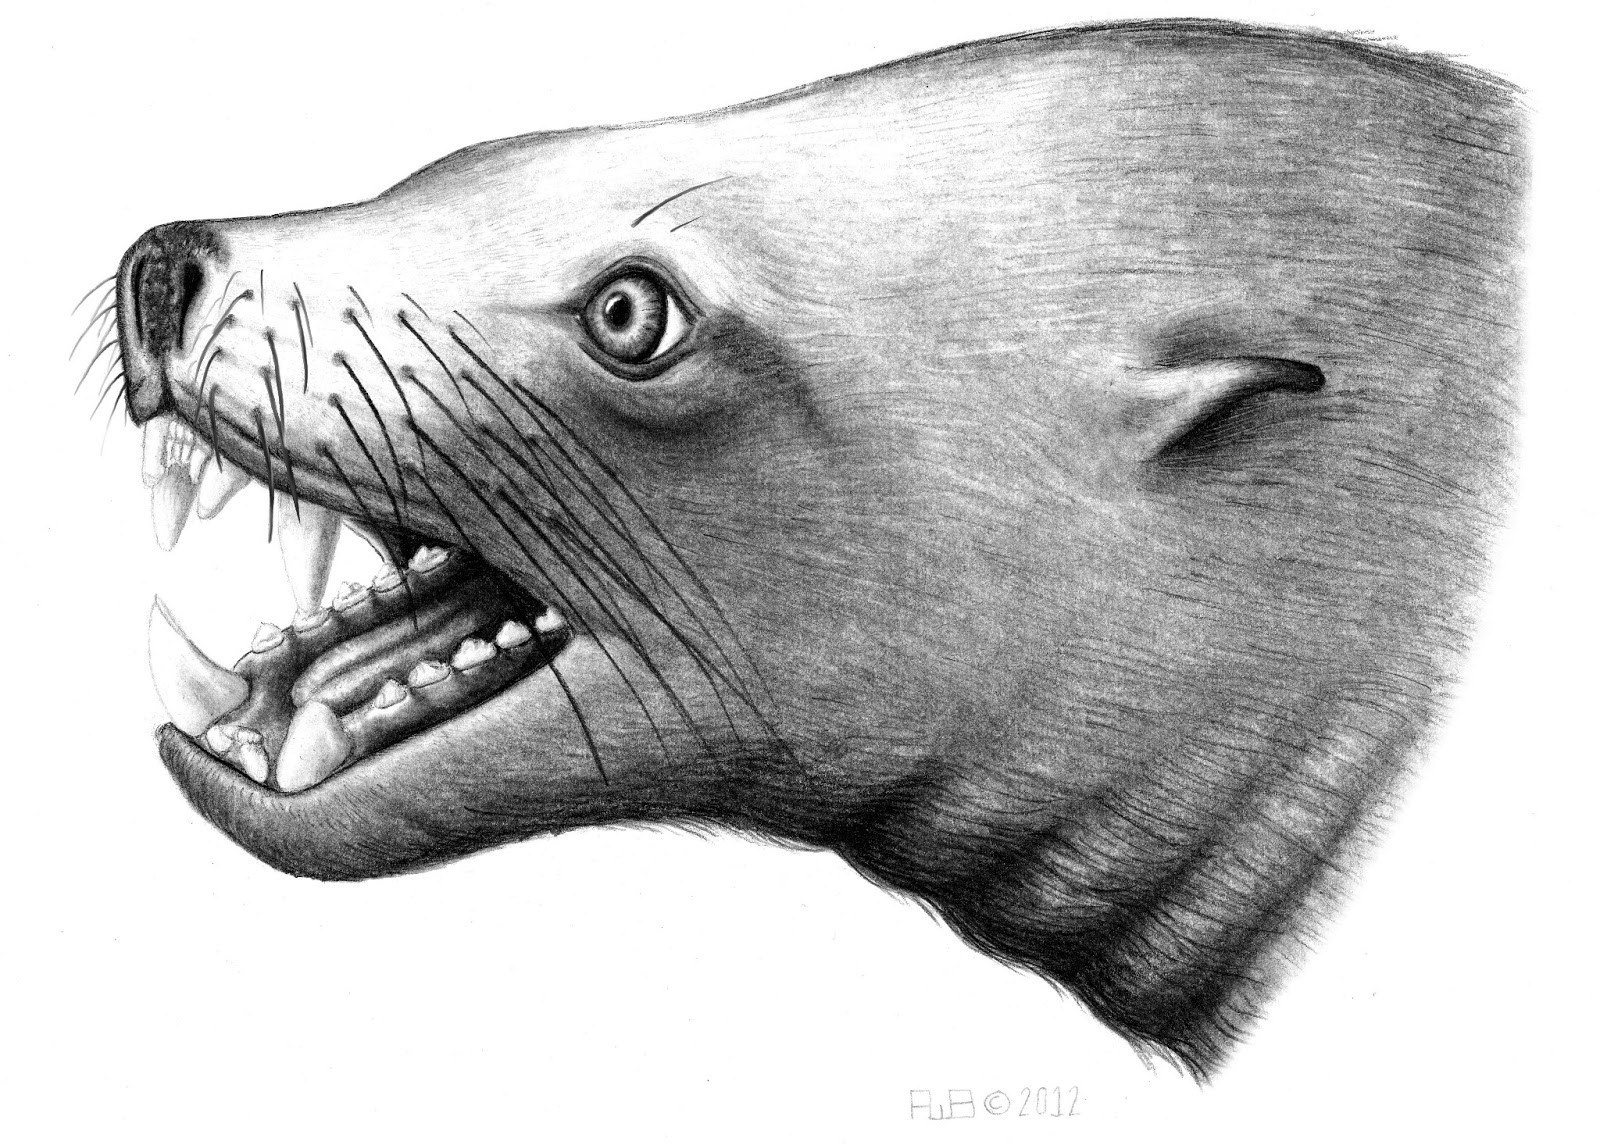 Stellers sea cow  Wikipedia